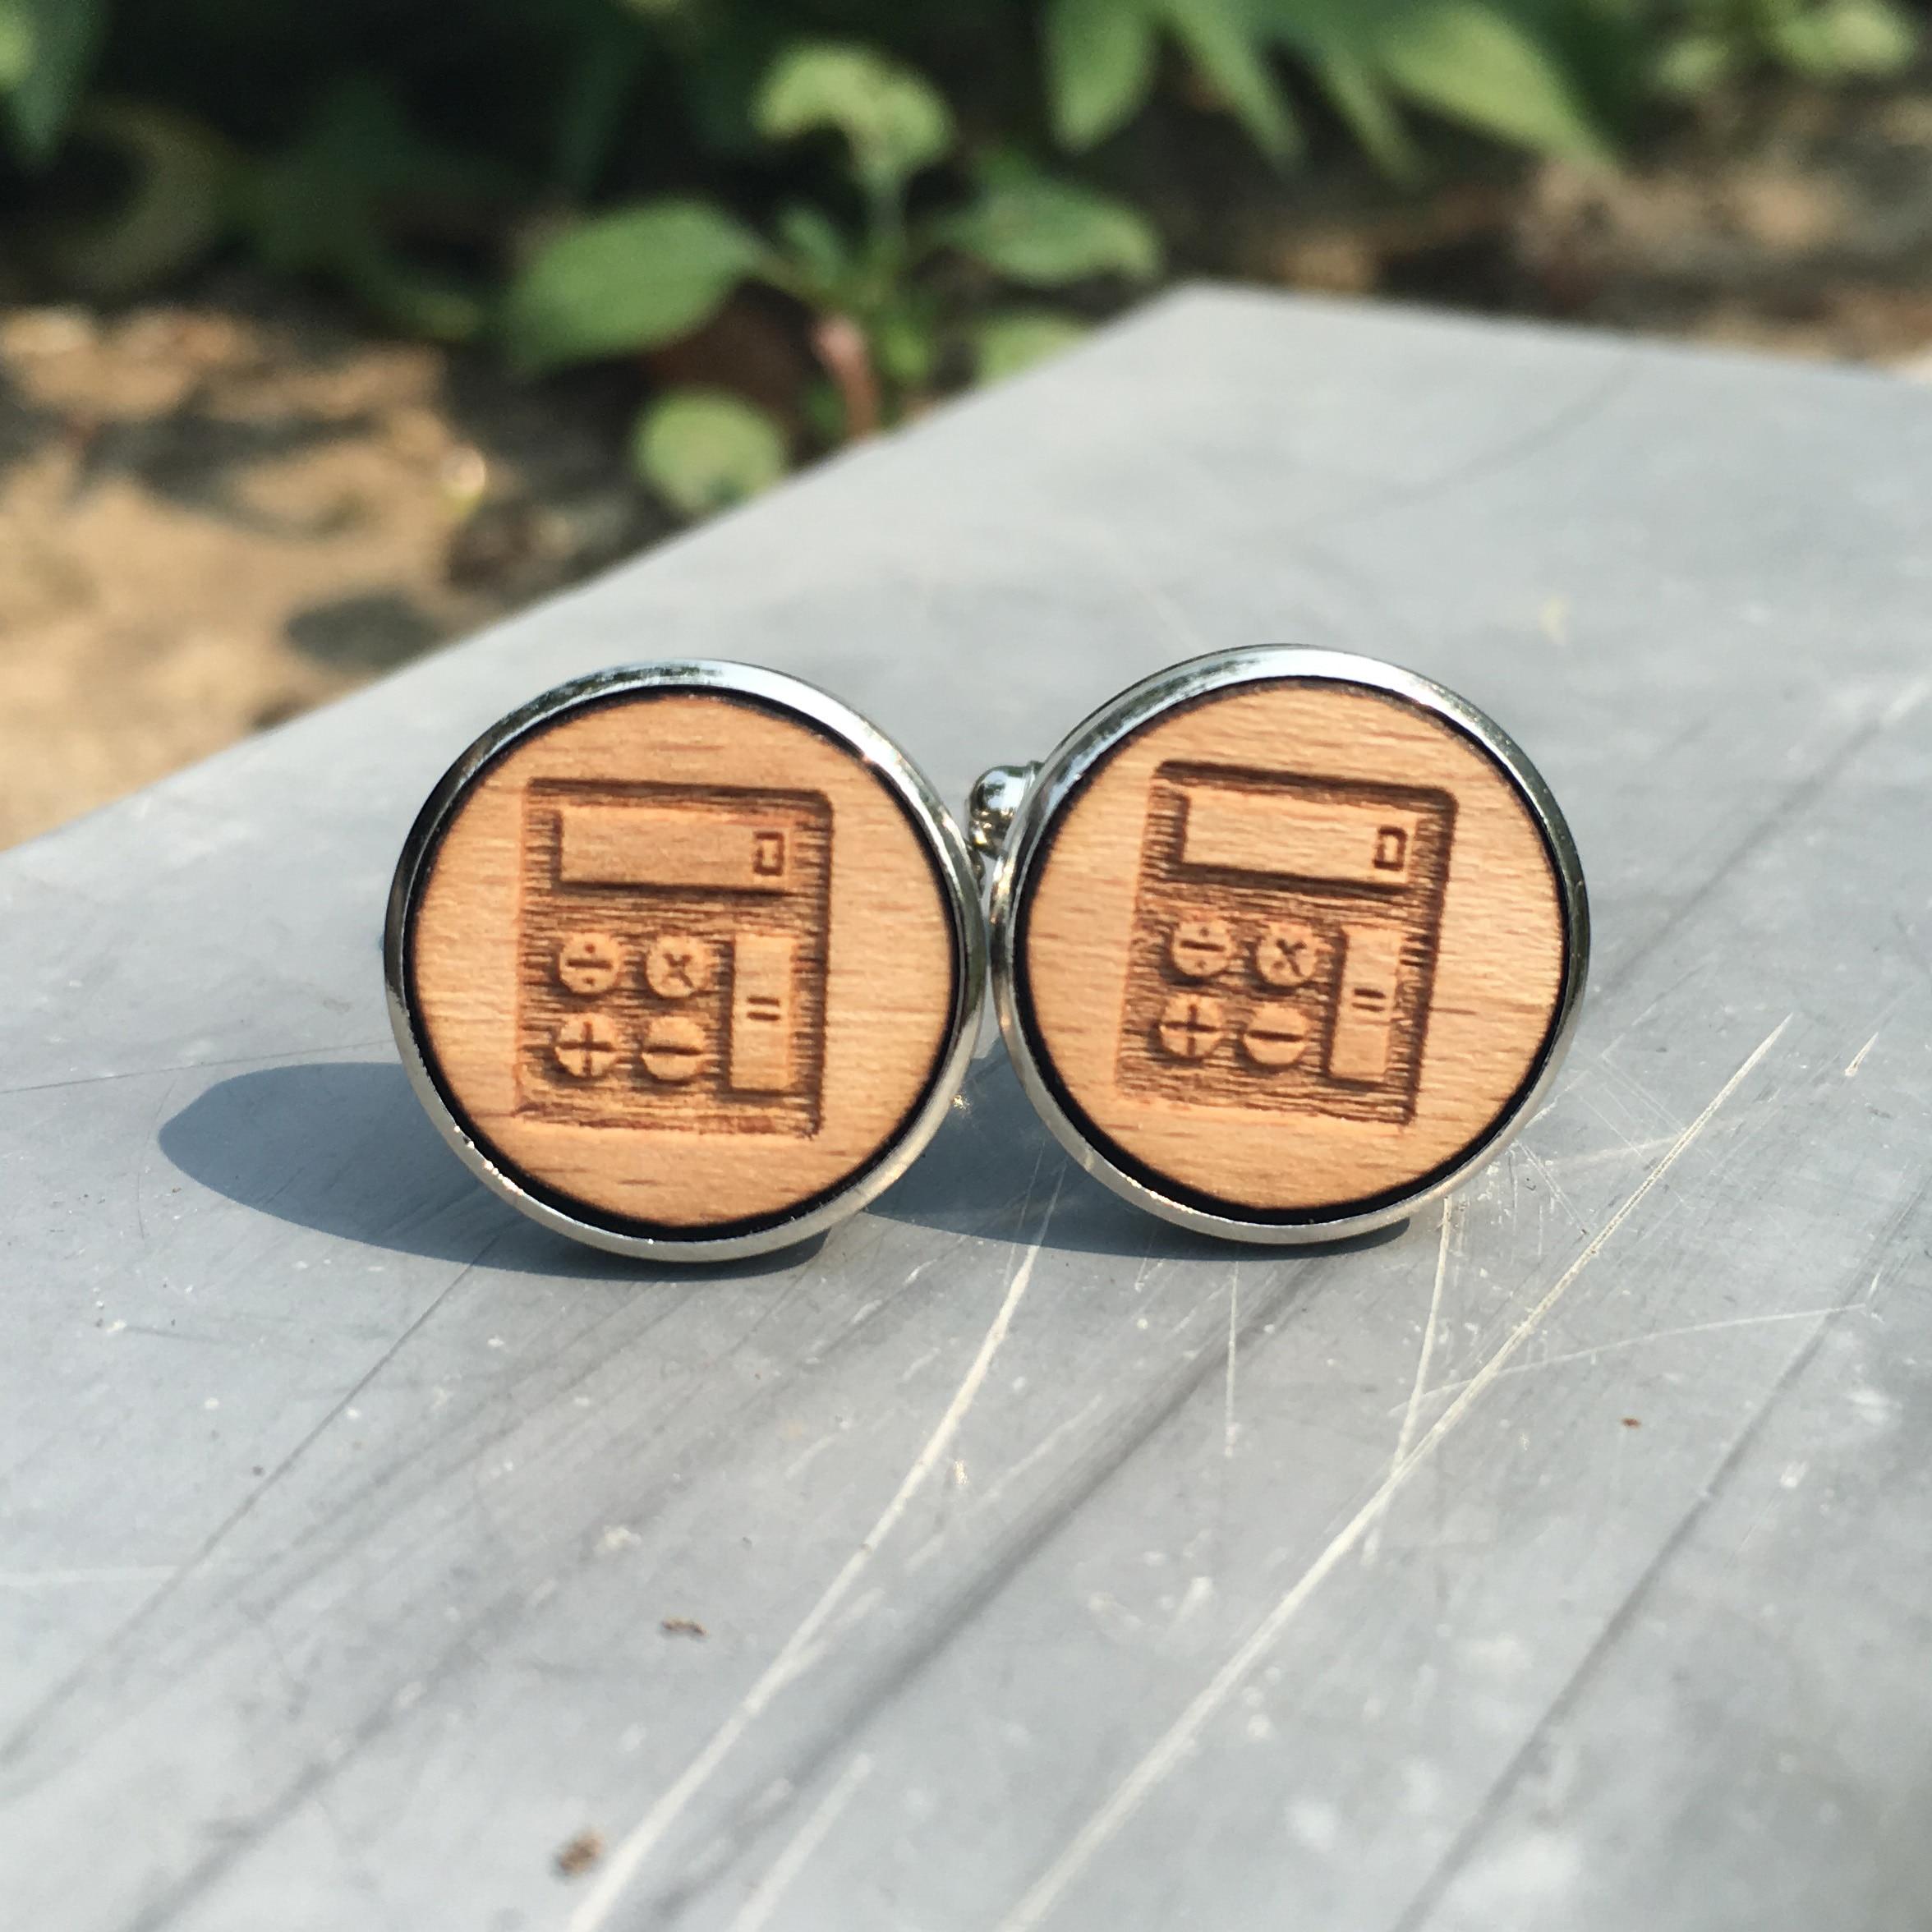 Wedding Gift From Groomsmen: Calculator Wodden Cuff Links Unique Numbers Wood Wedding